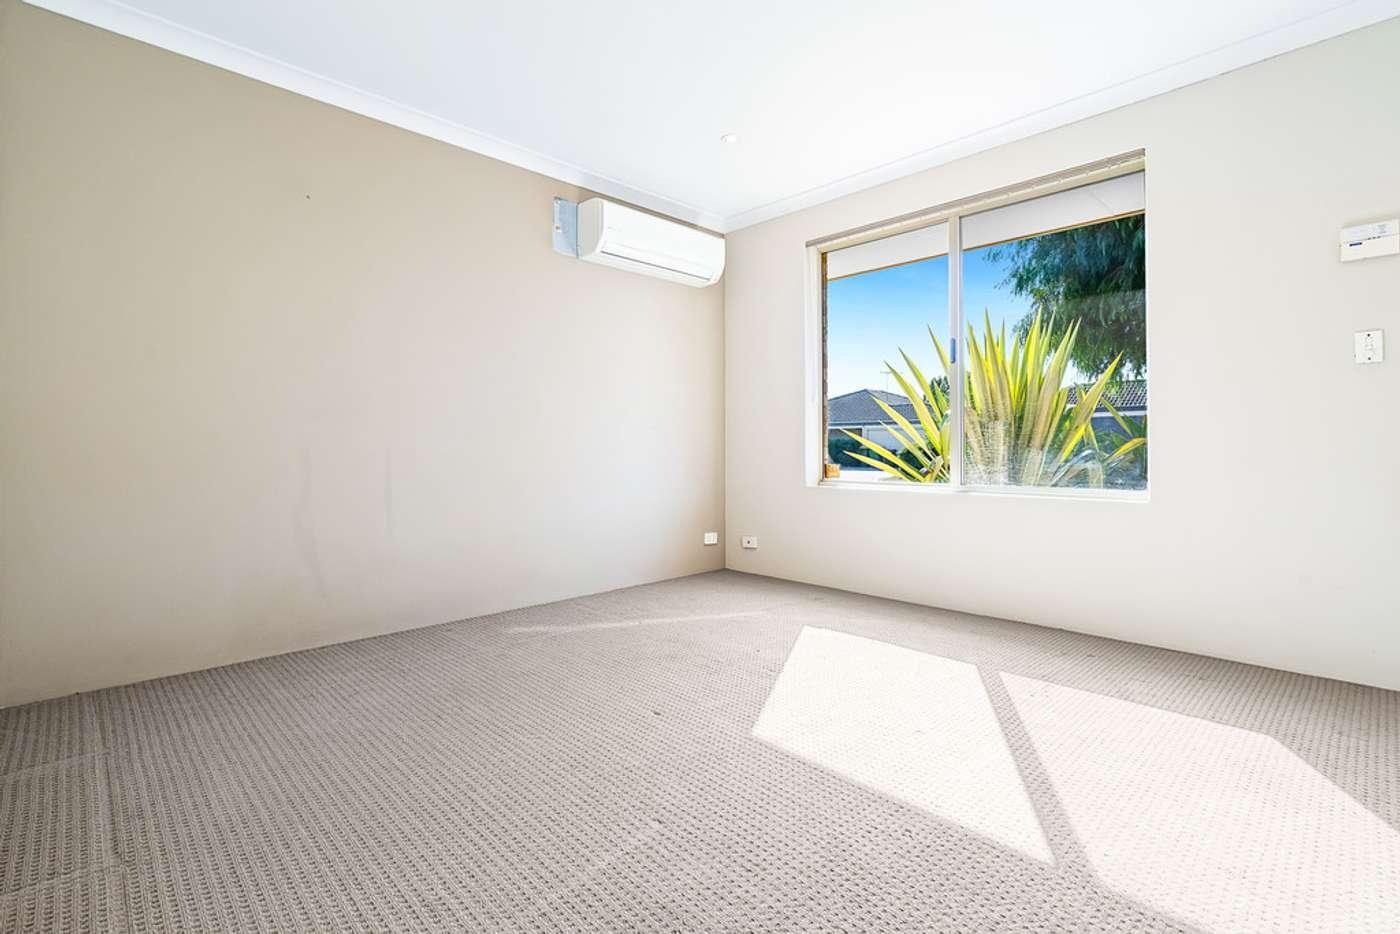 Seventh view of Homely house listing, 17 Menora Loop, Warnbro WA 6169